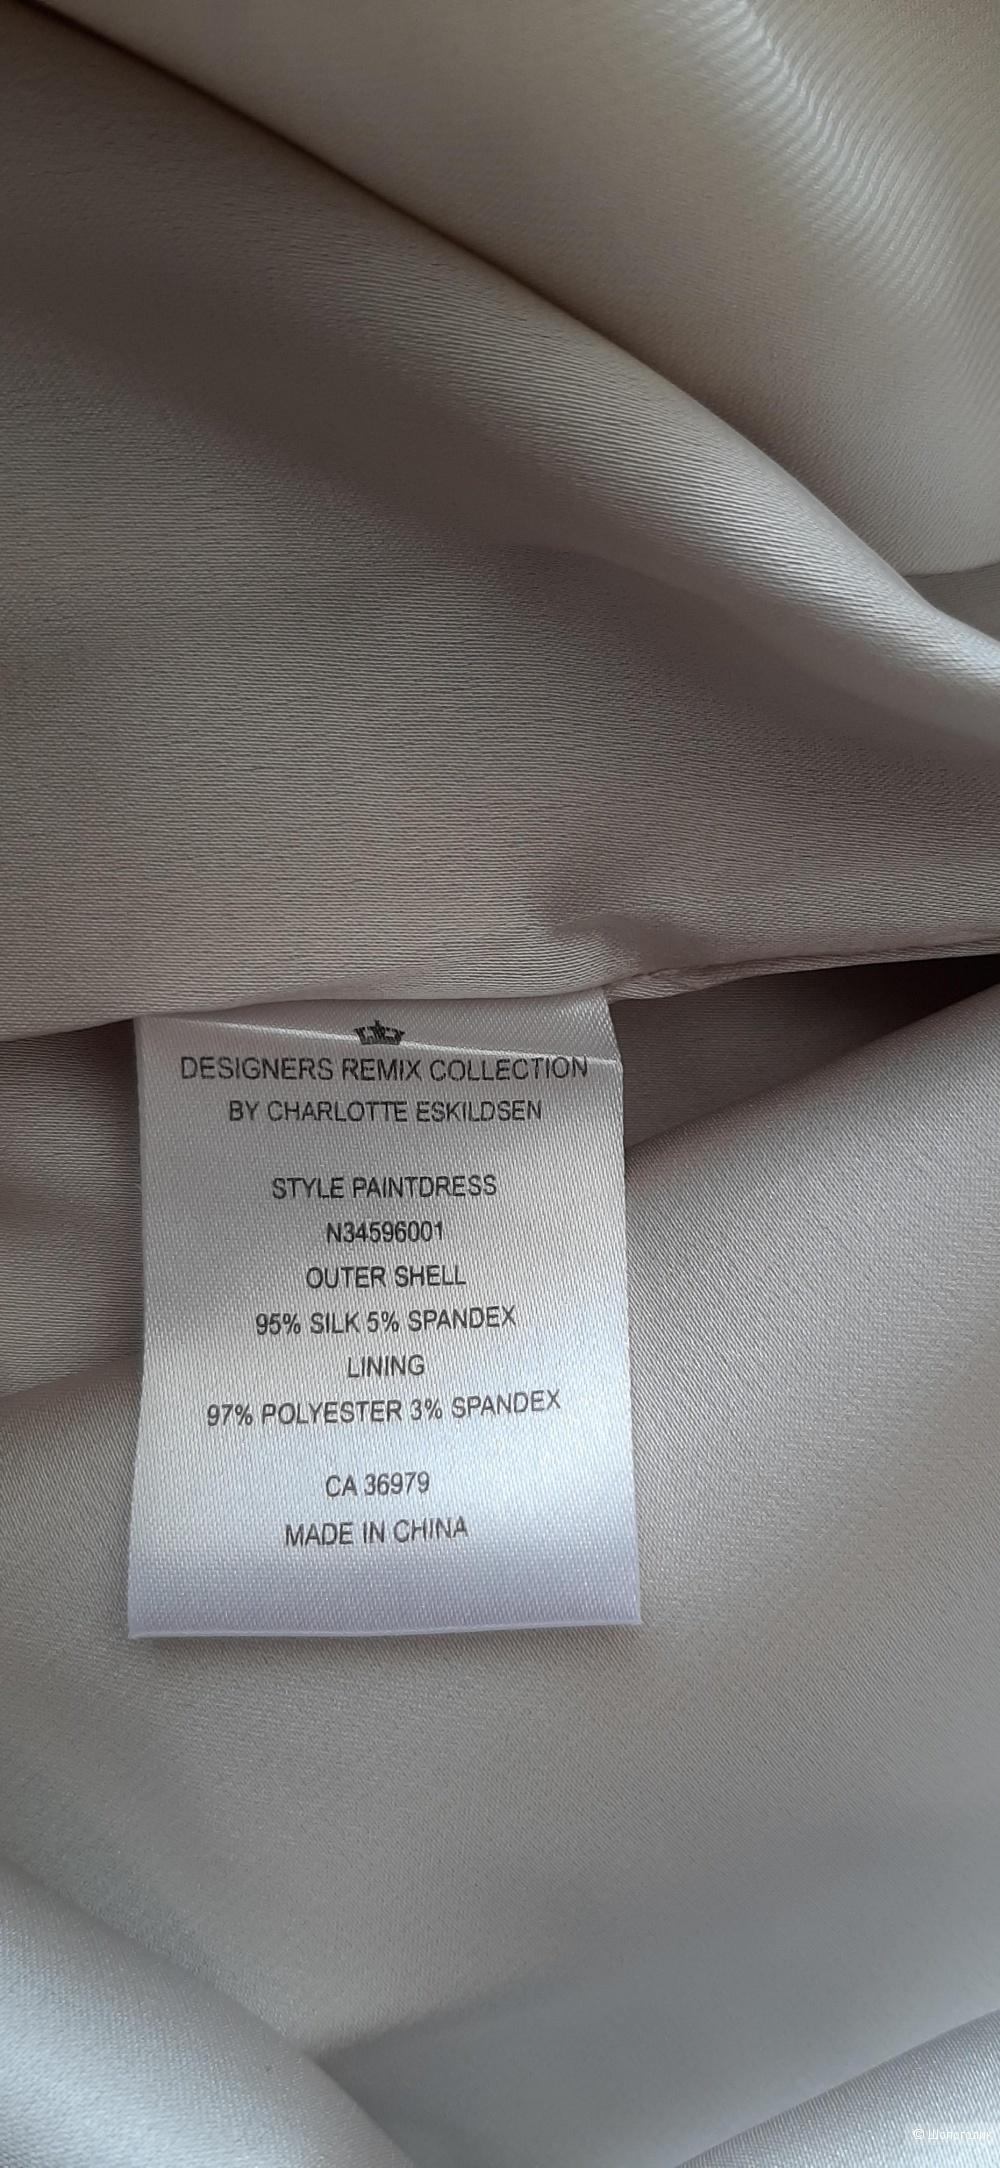 Платье Designers Remix Collection by Charlotte Eskildsen, размер 34 eur (40-42рус)